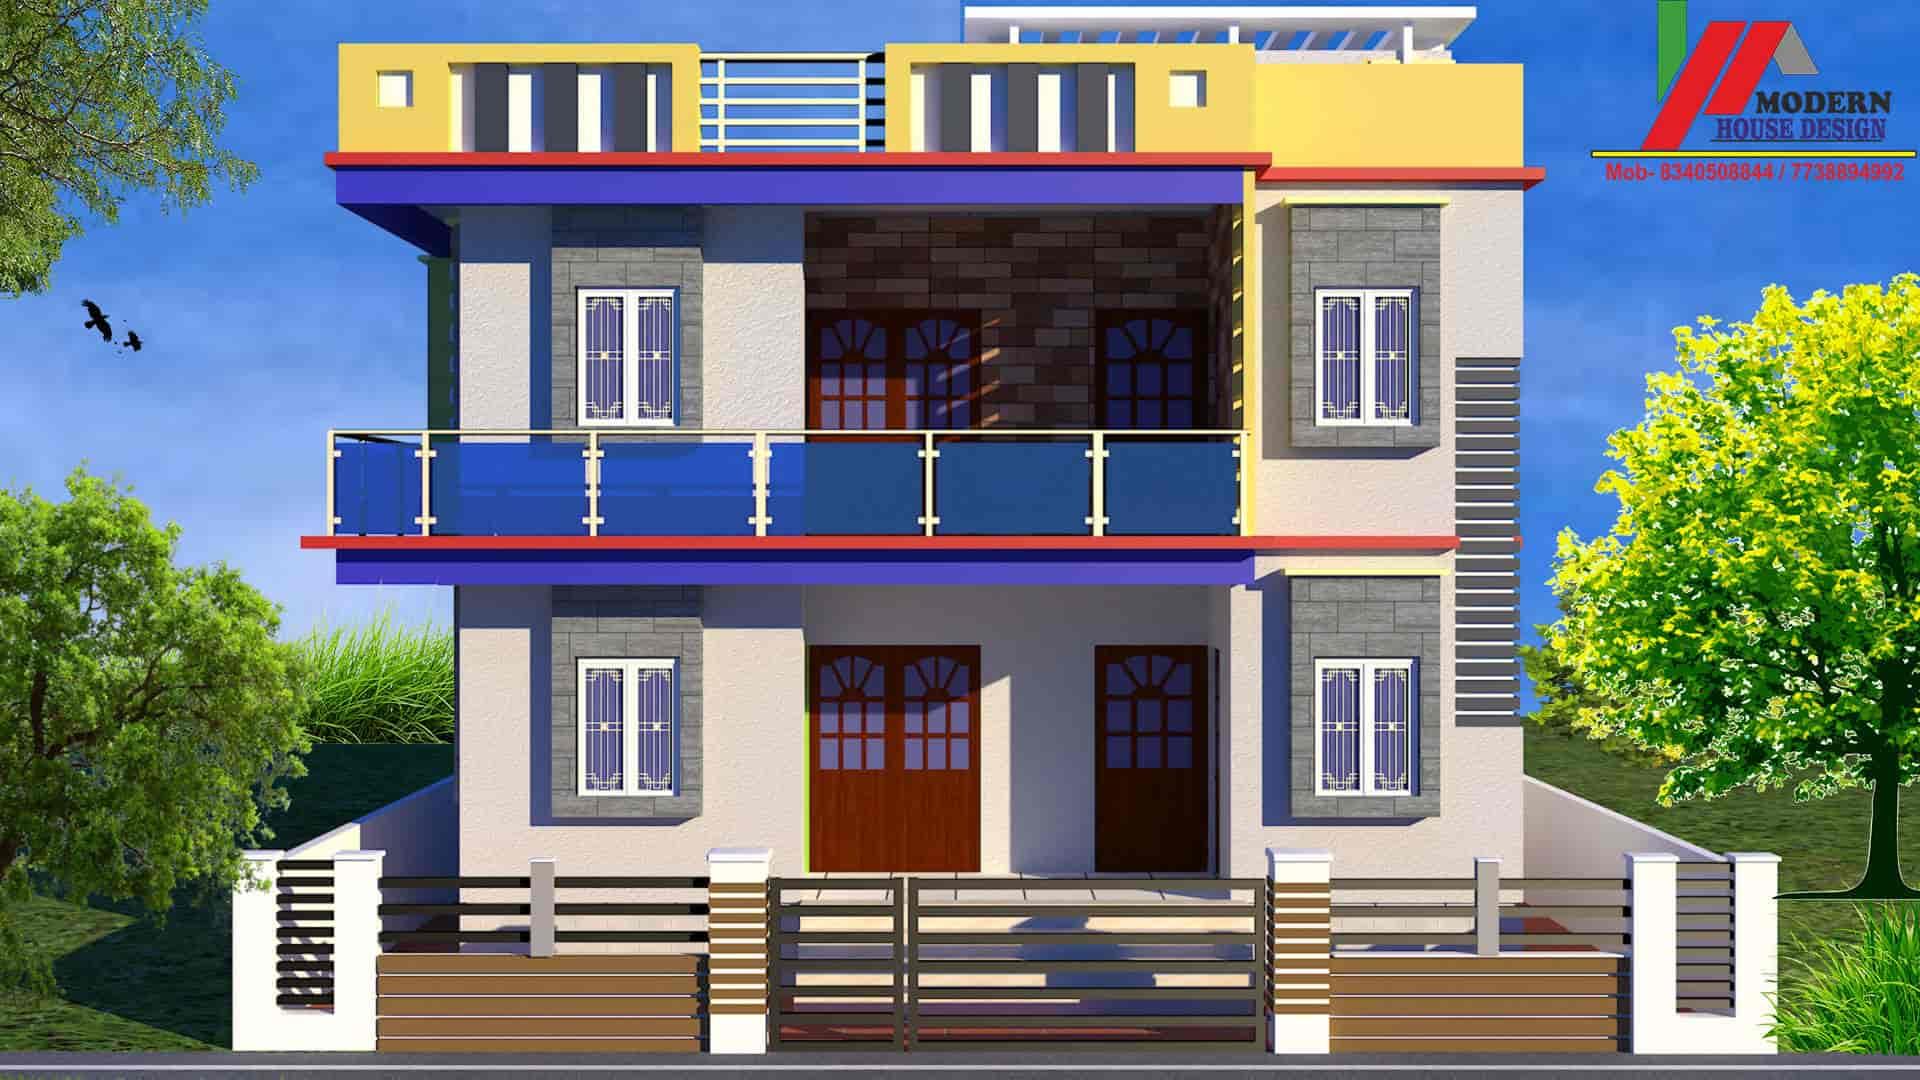 Modern House Design Durga Sthan Manddir Architects In